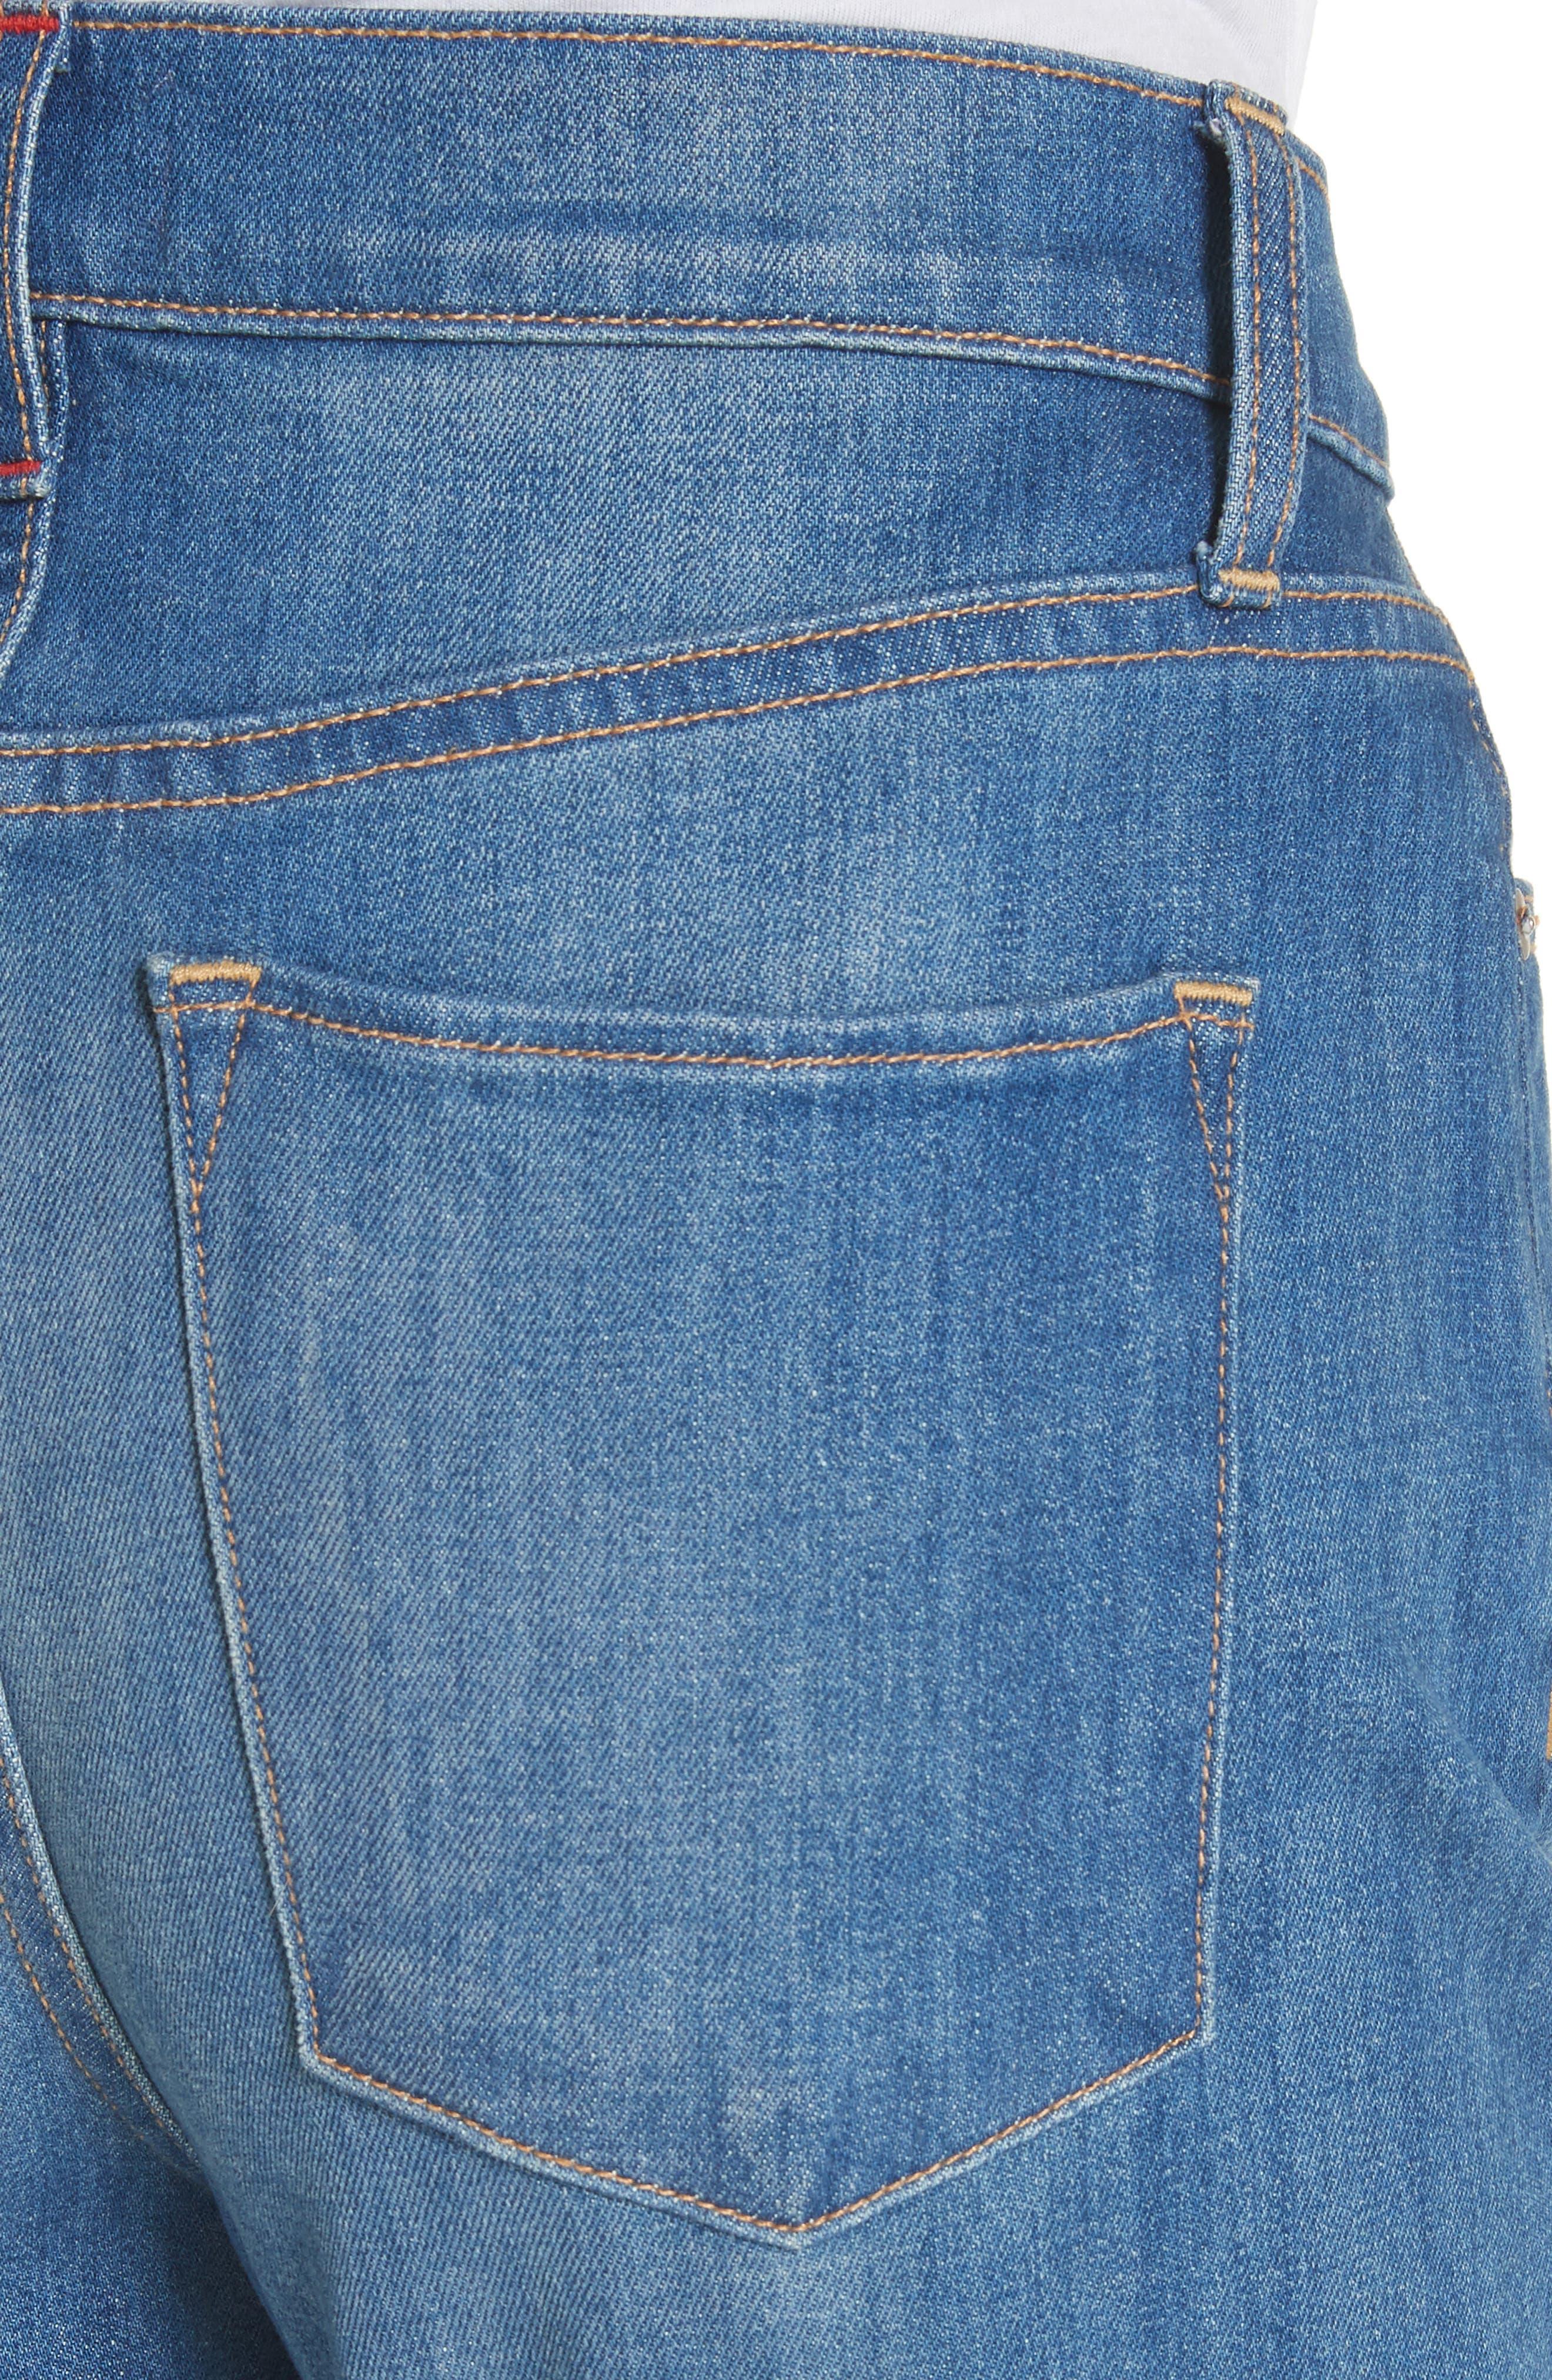 AO.LA Good High Waist Ankle Skinny Jeans,                             Alternate thumbnail 4, color,                             Side Hustle